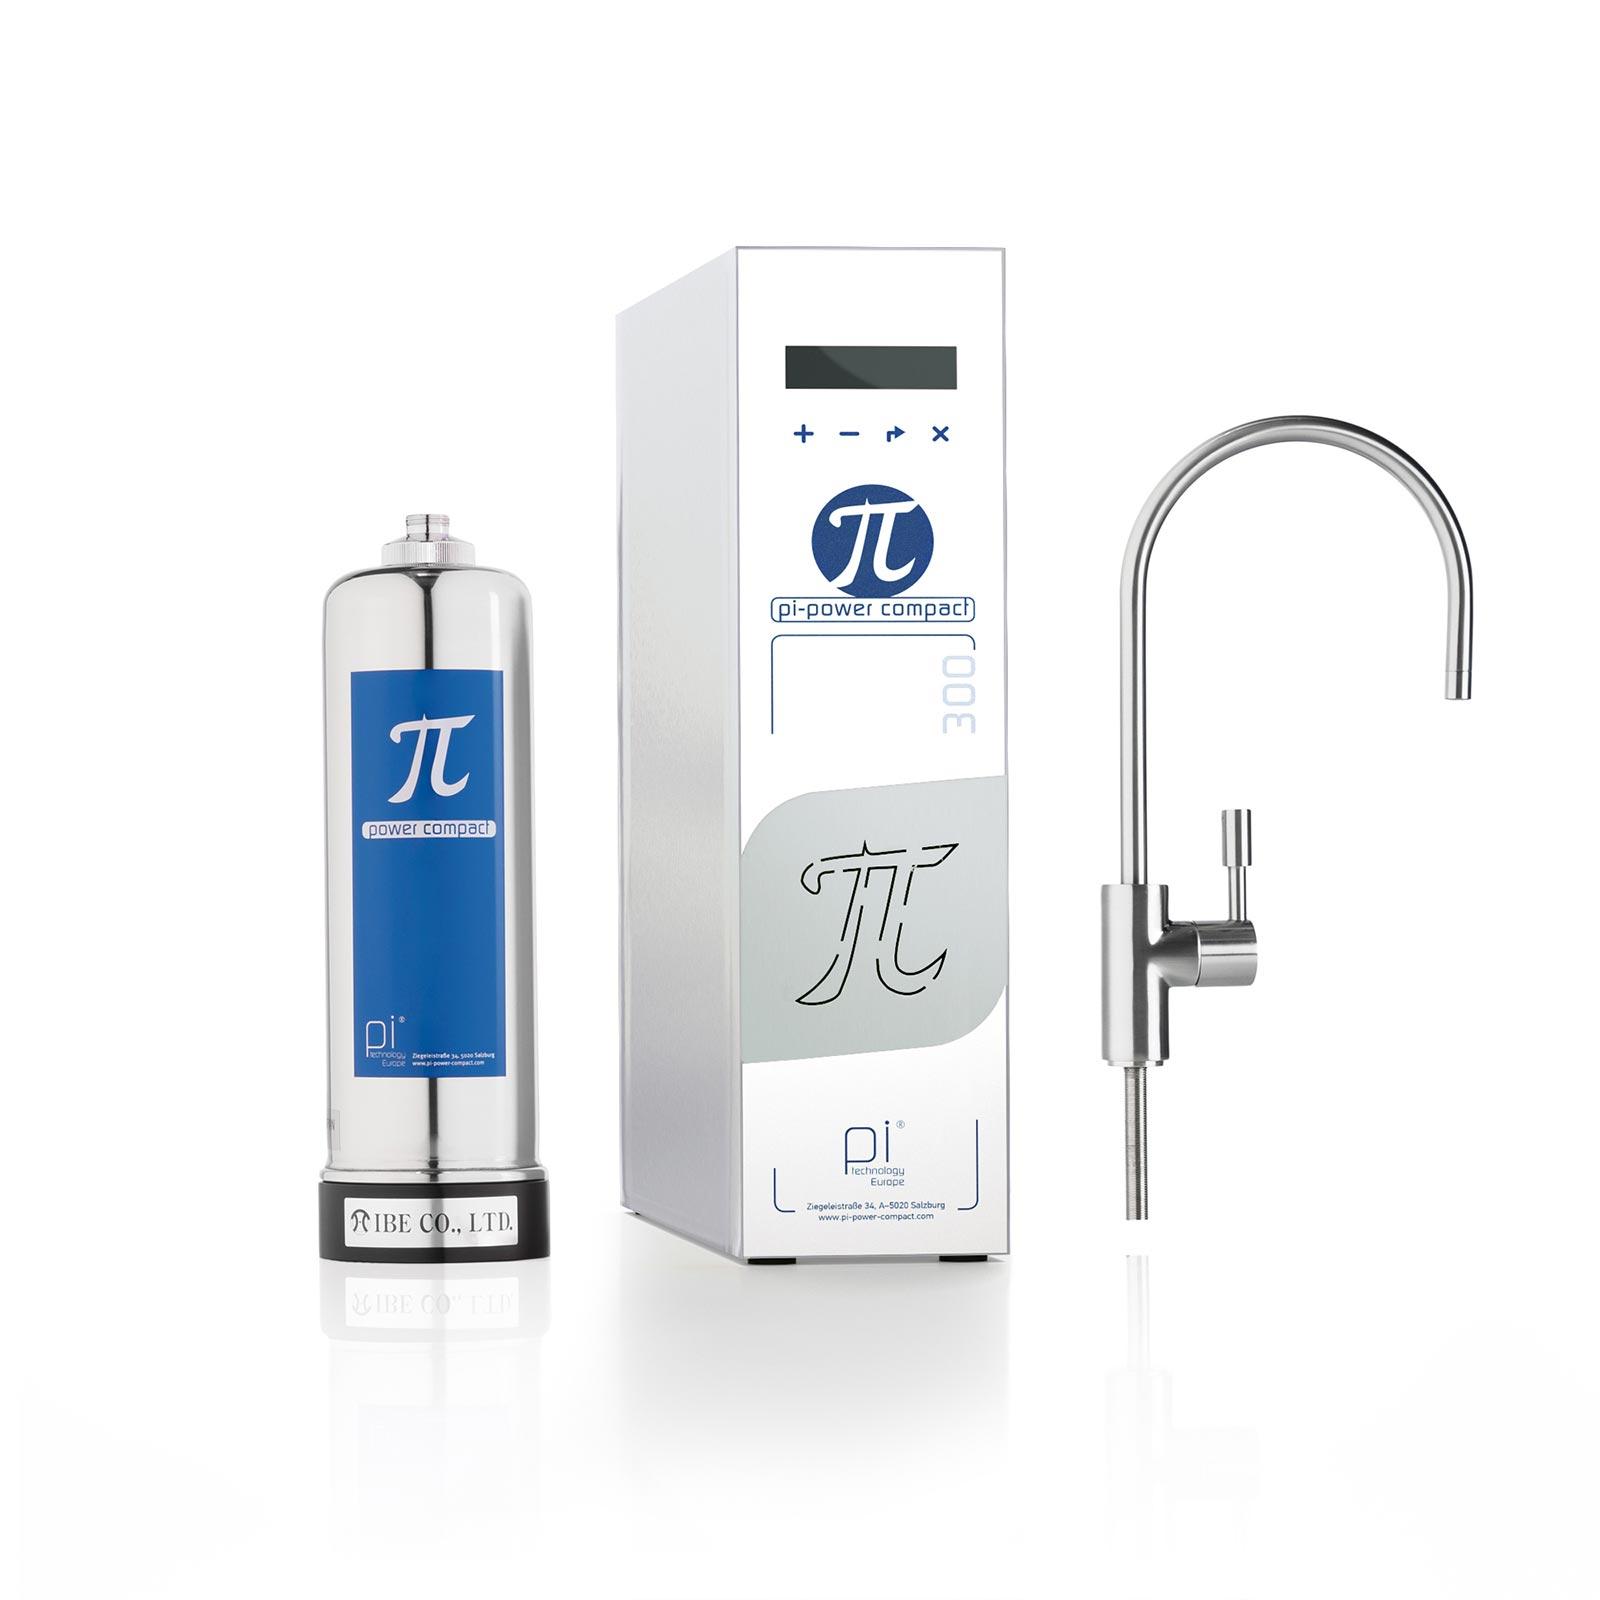 PI®-Power-Compact Standard 300 GPD +Glyphosat-Filterset +UV-LED